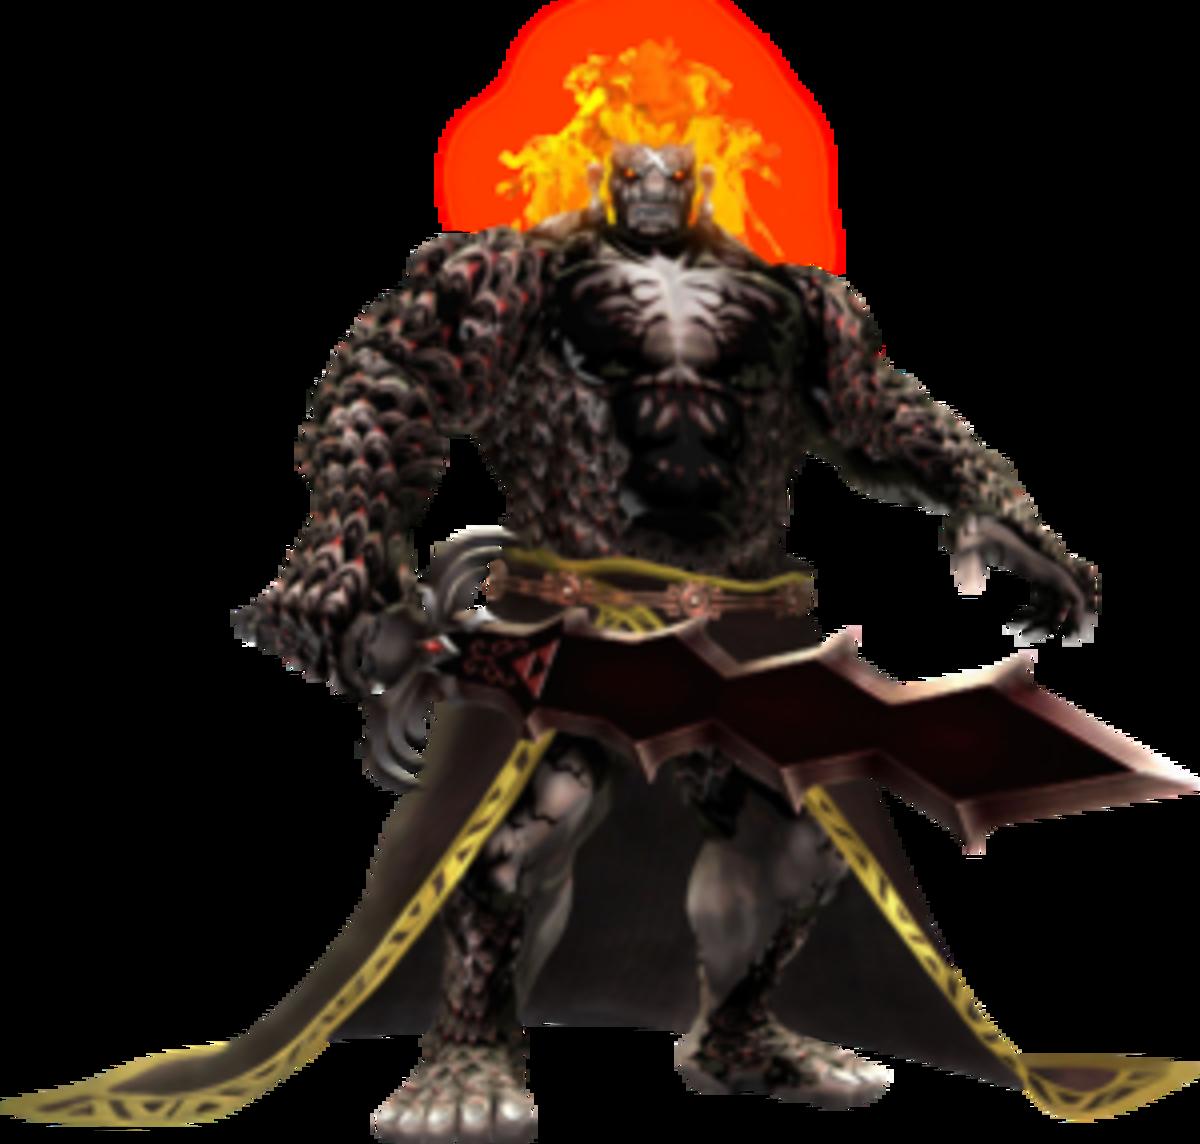 Skyward Sword: How To Beat The Demon King Demise (Final Boss)